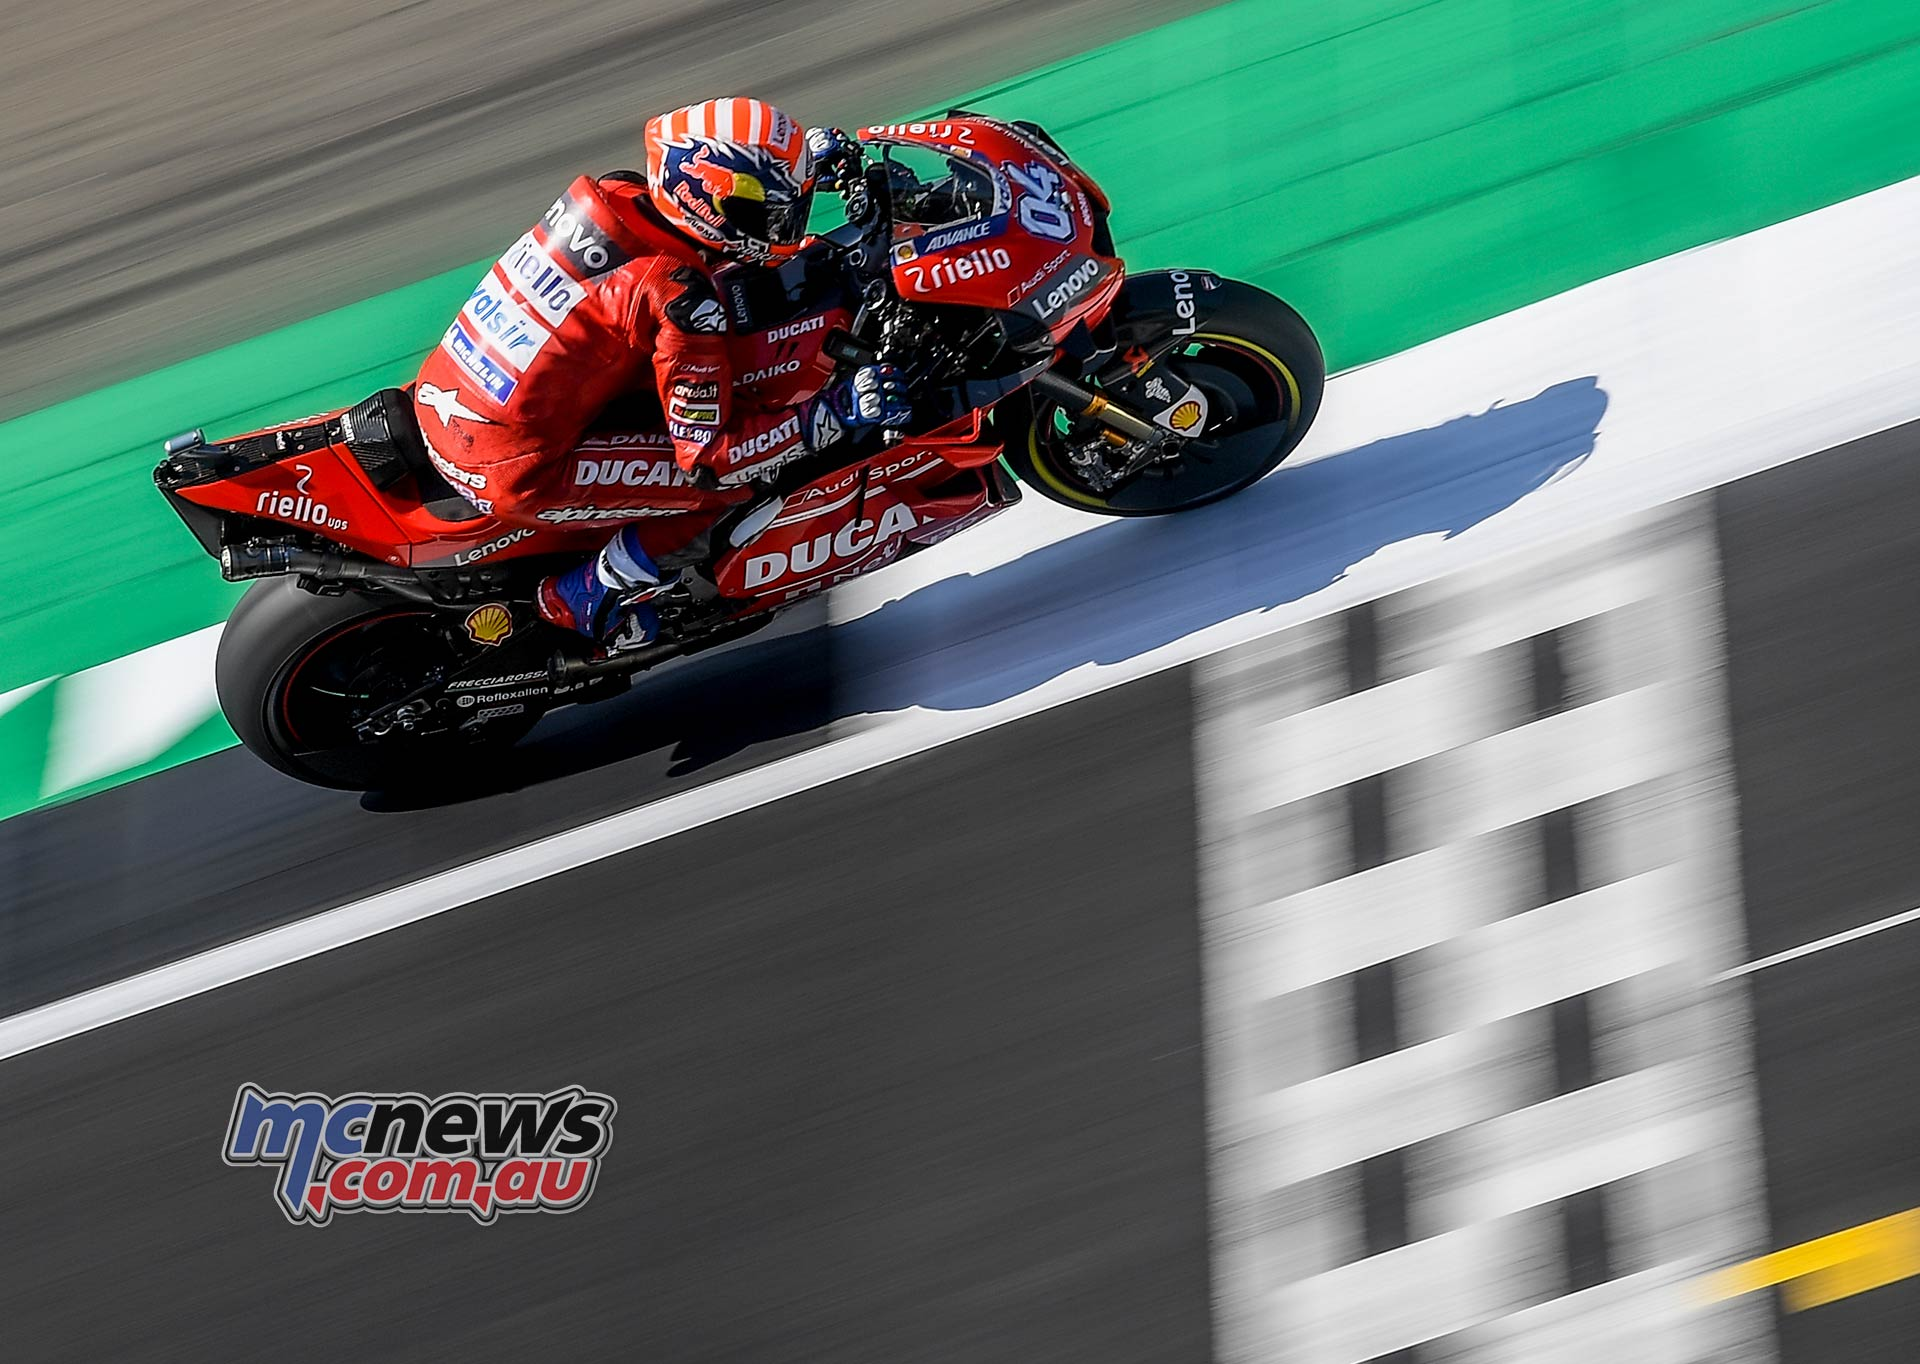 MotoGP Rnd Silverstone Fri Dovizioso